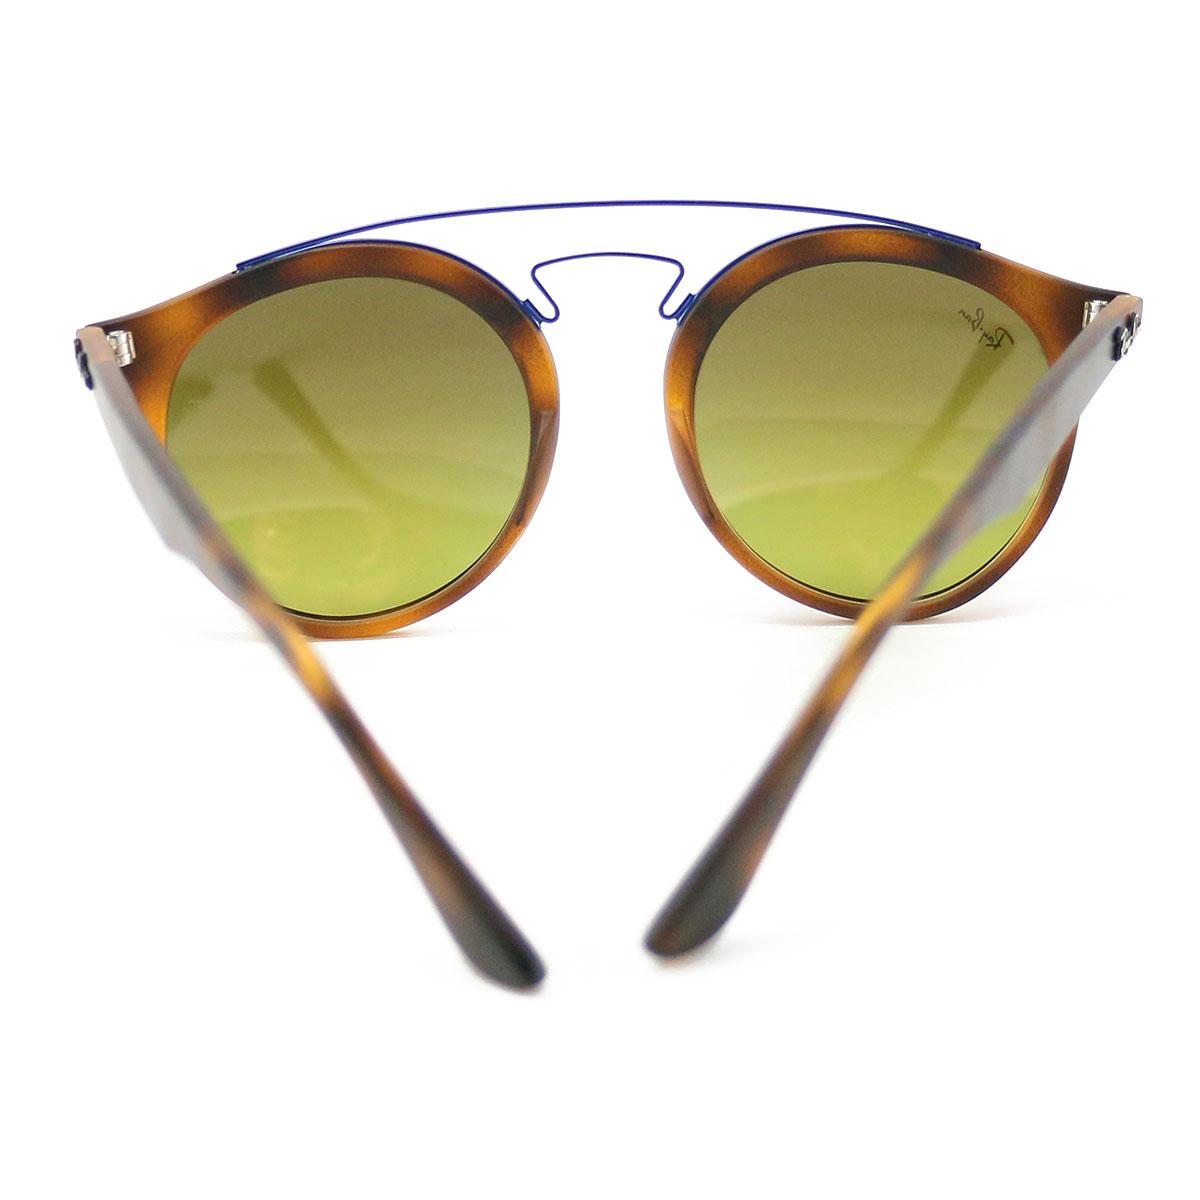 455e8d028cb7c New Ray-Ban Sunglasses RB4256 6266B0 Non-Polarized 49 20 150 Matte  Havana Lillac